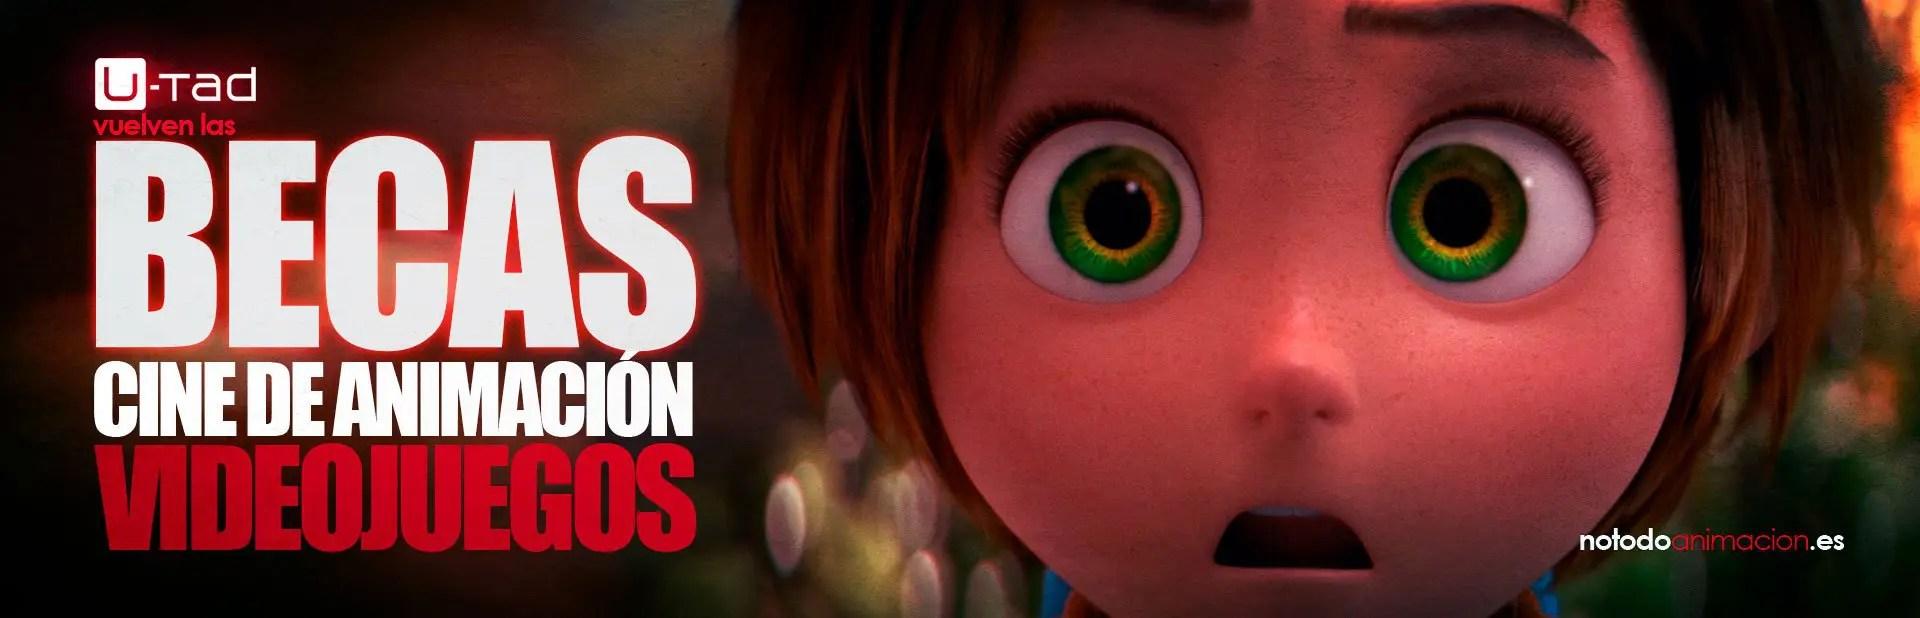 becas animacion videojuegos vfx